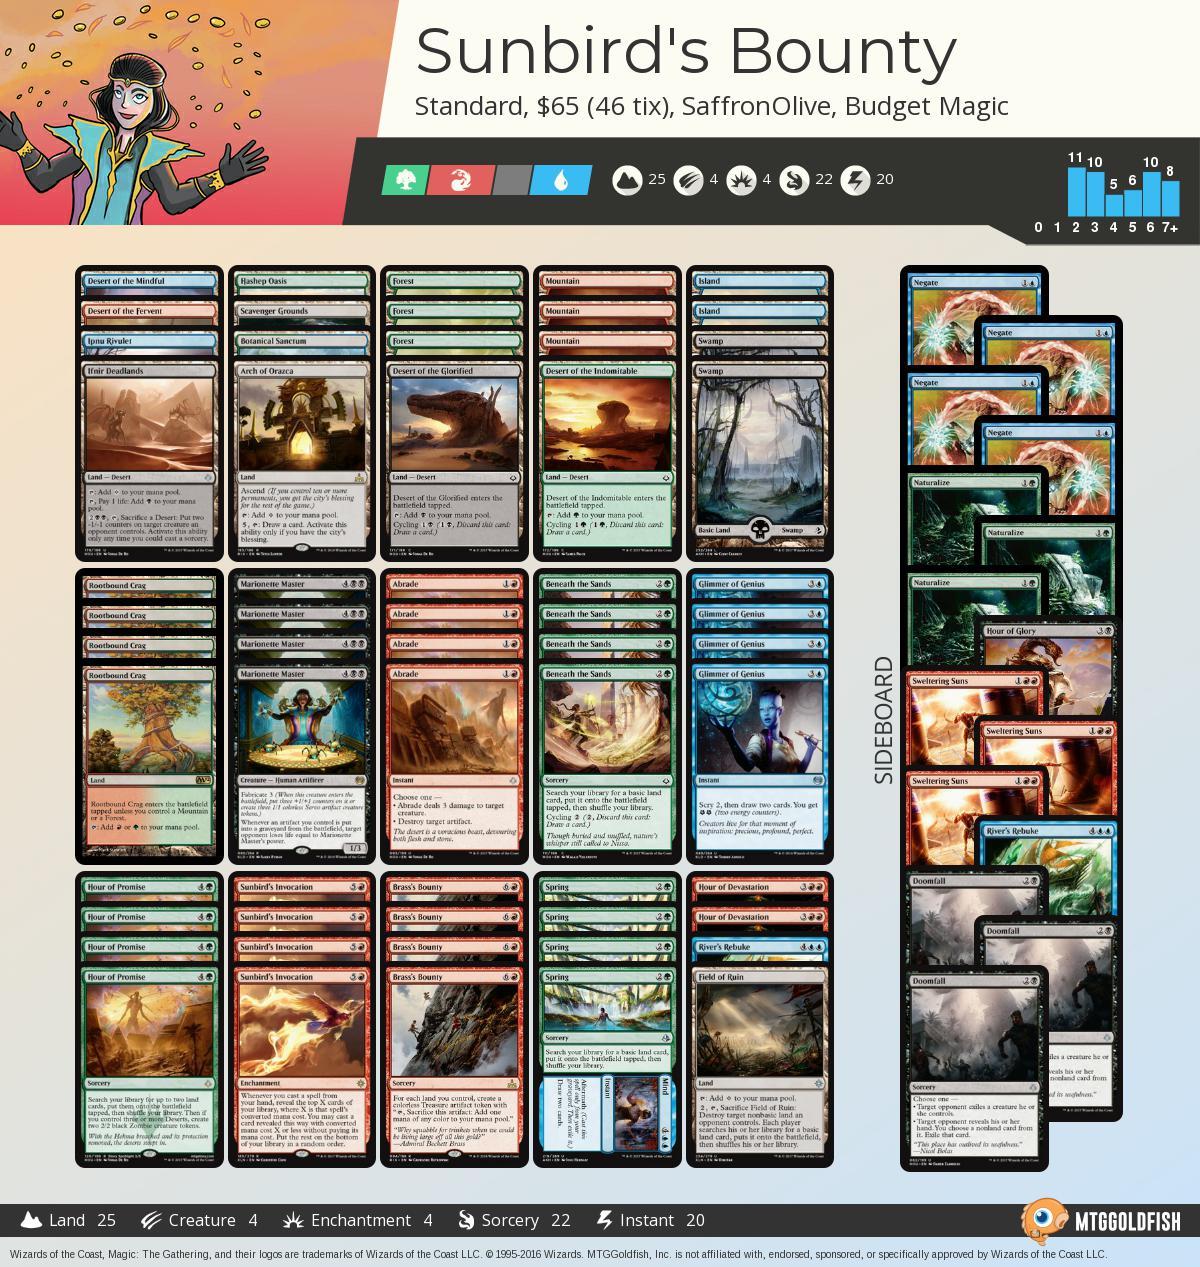 Sunbird%2527s%2bbounty 24240846 00c4 4b8f b61d 64ff92af180d%2ejpg